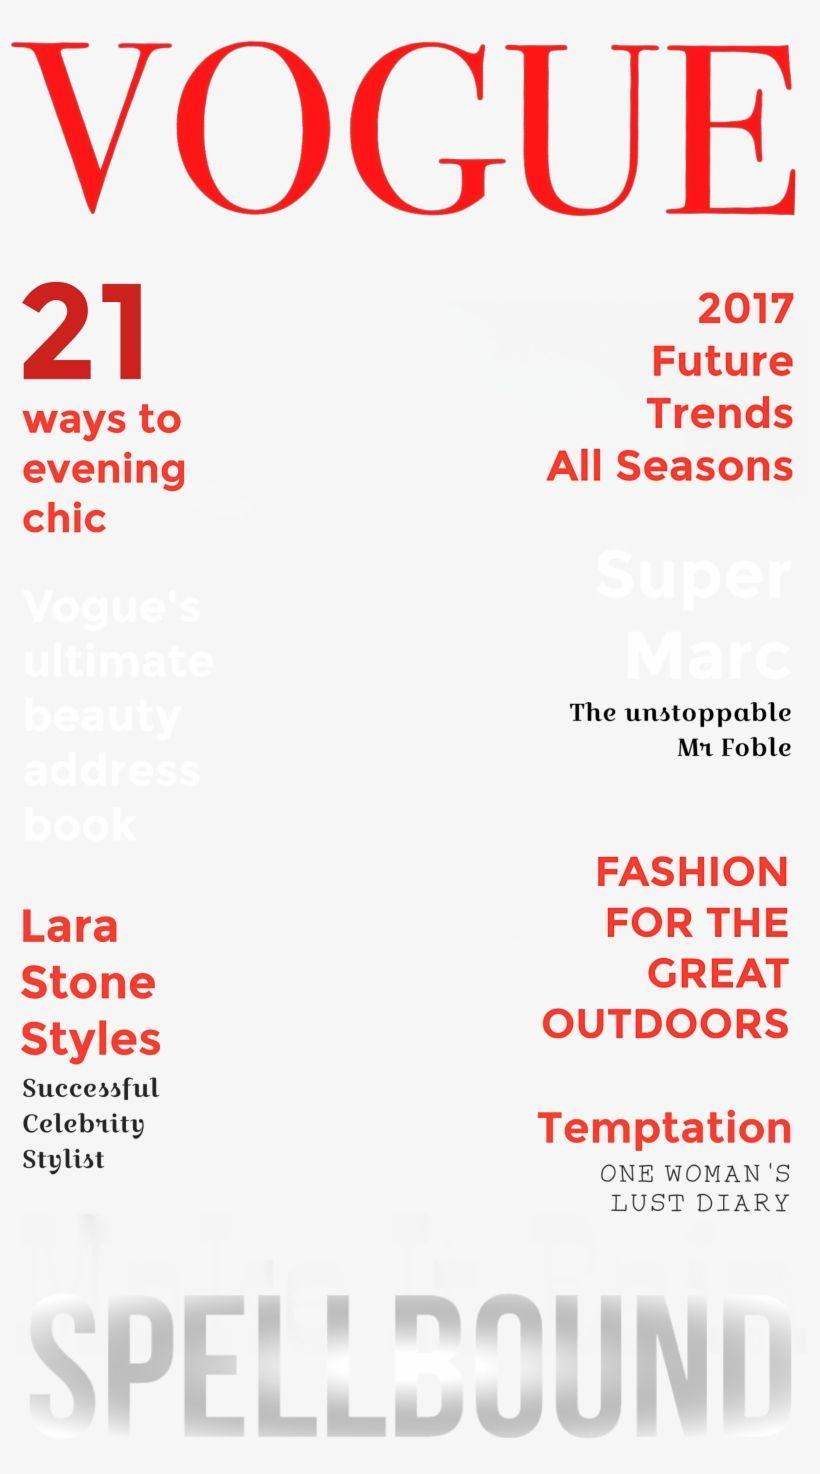 019 Fake Magazine Cover Template Ideas 1940716